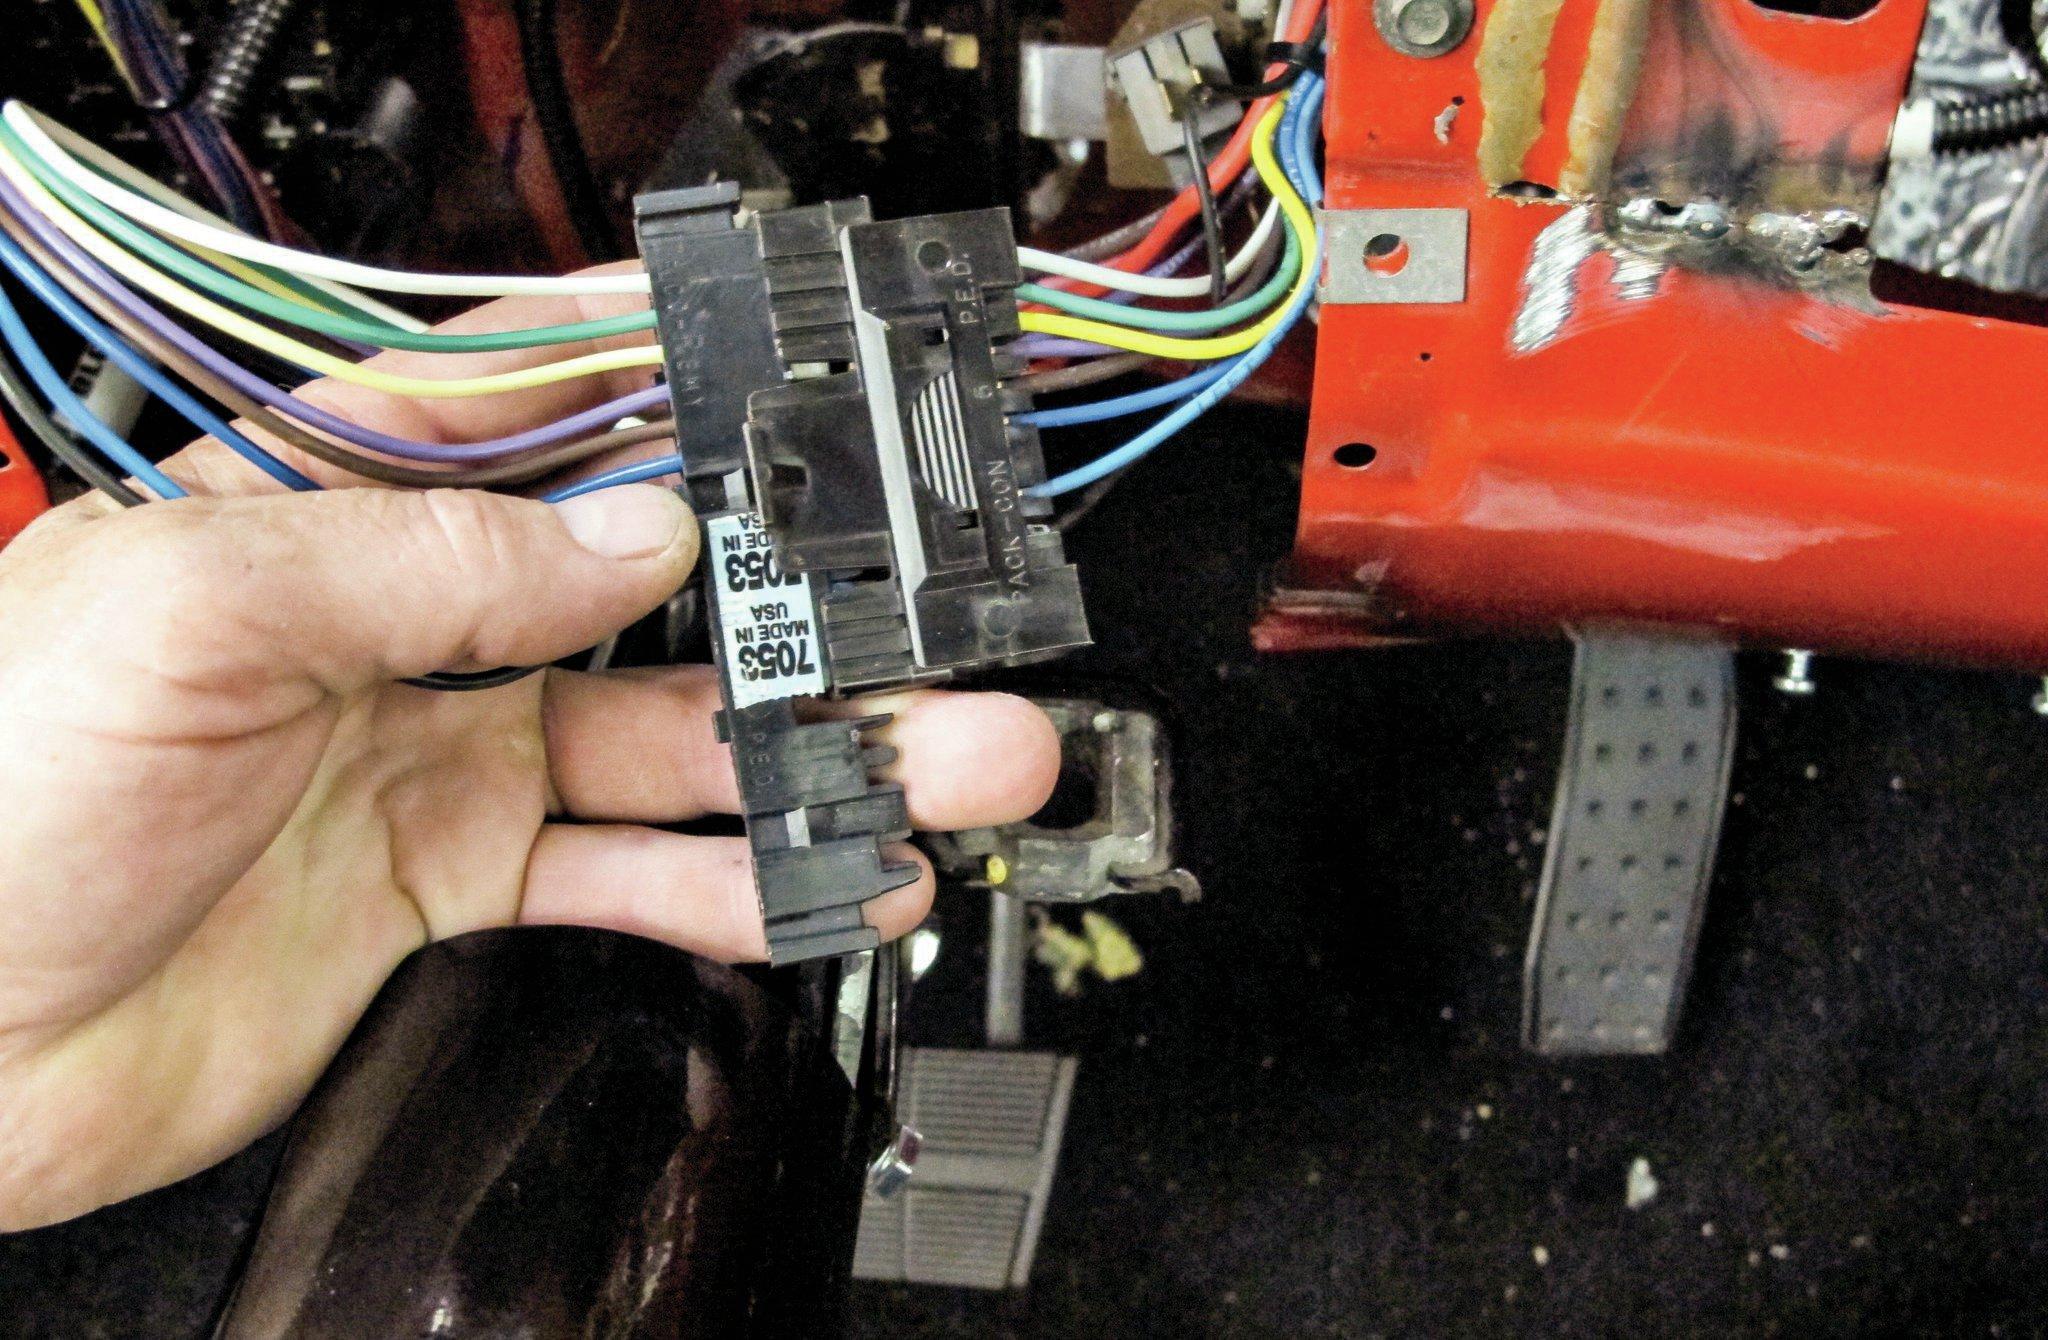 1985 c10 wiring harness wiring diagram centre 1985 c10 wiring harness [ 2048 x 1340 Pixel ]